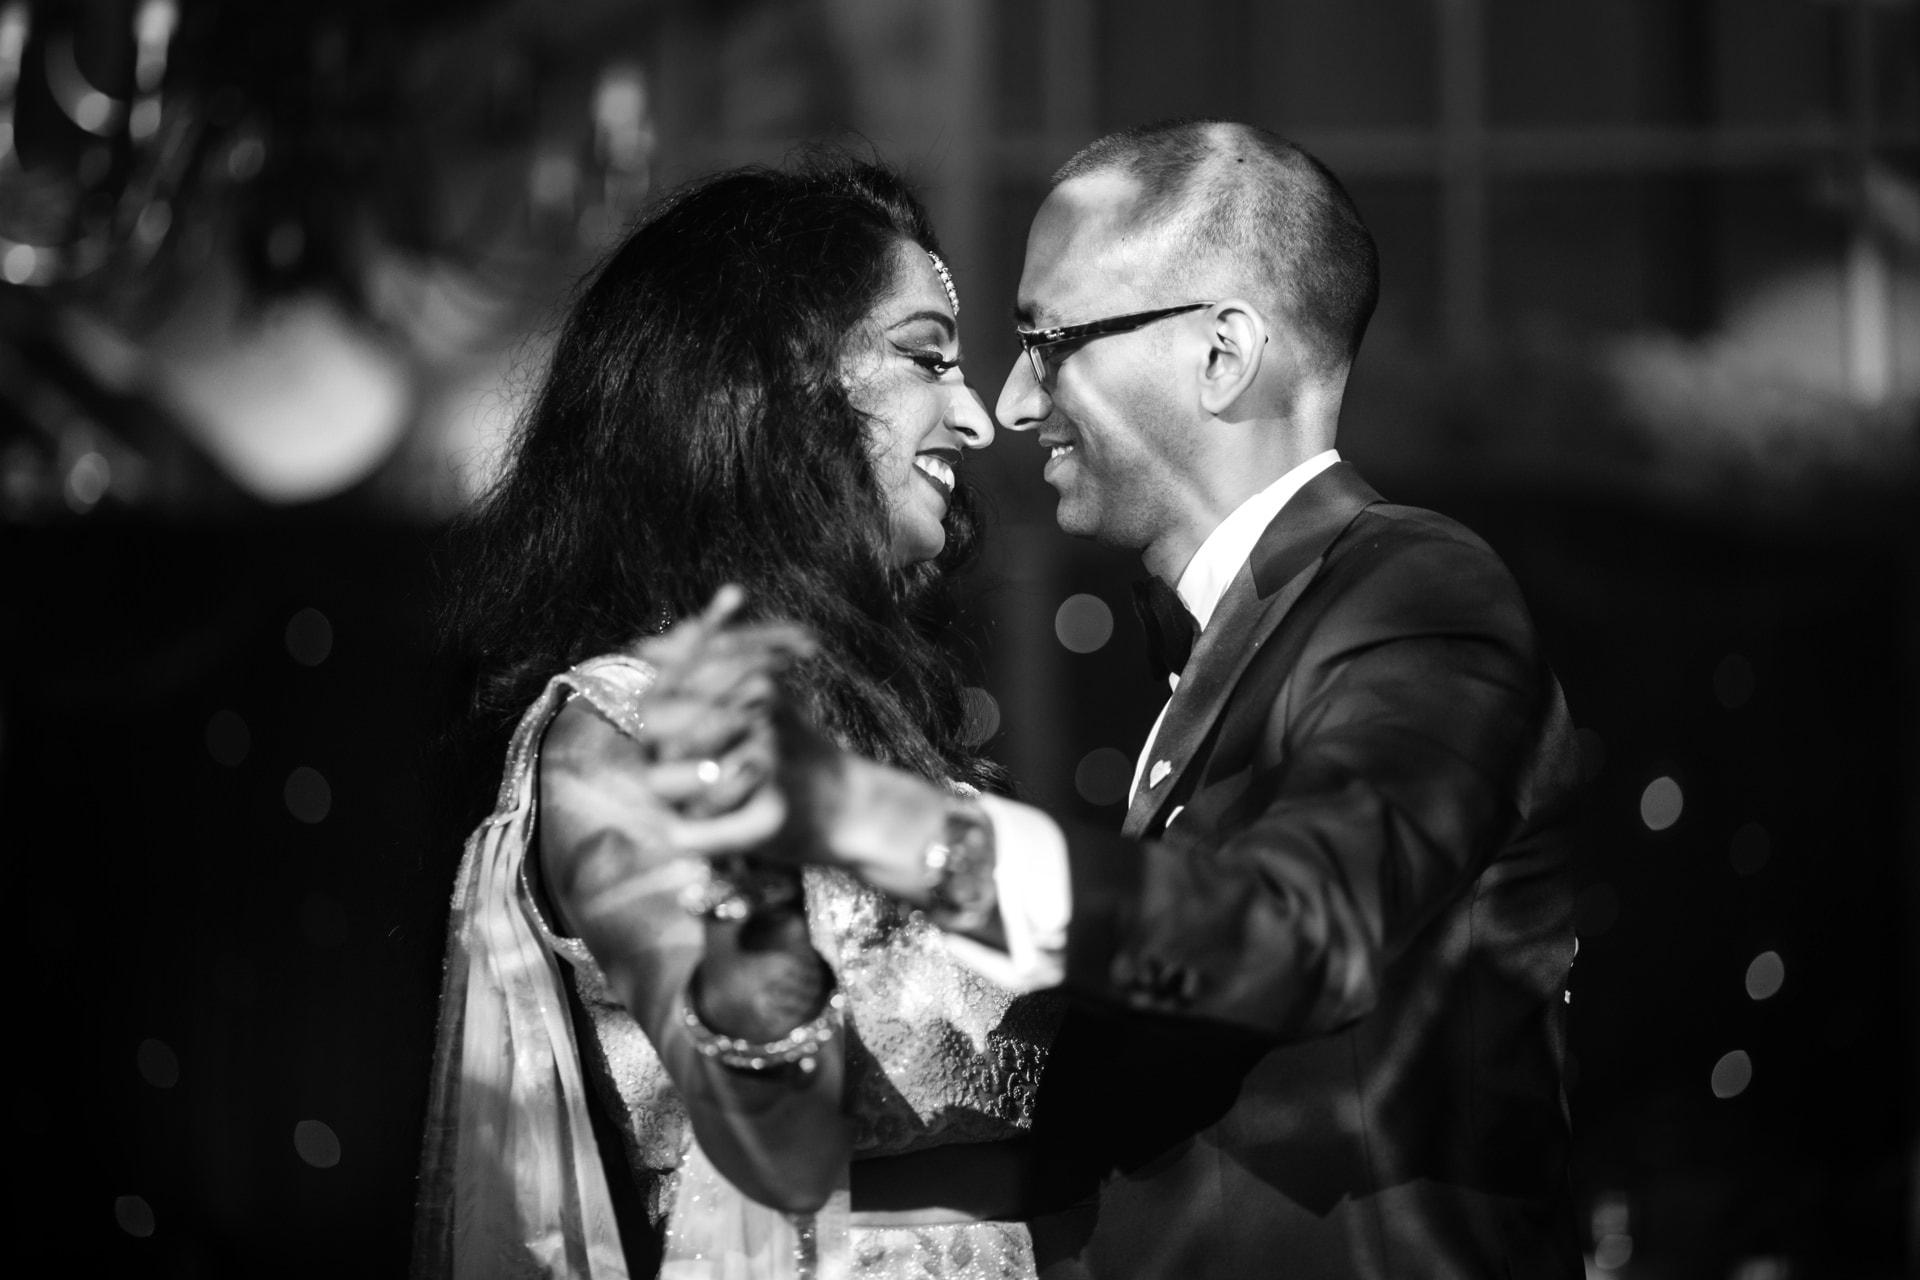 Asian Wedding couples first dance